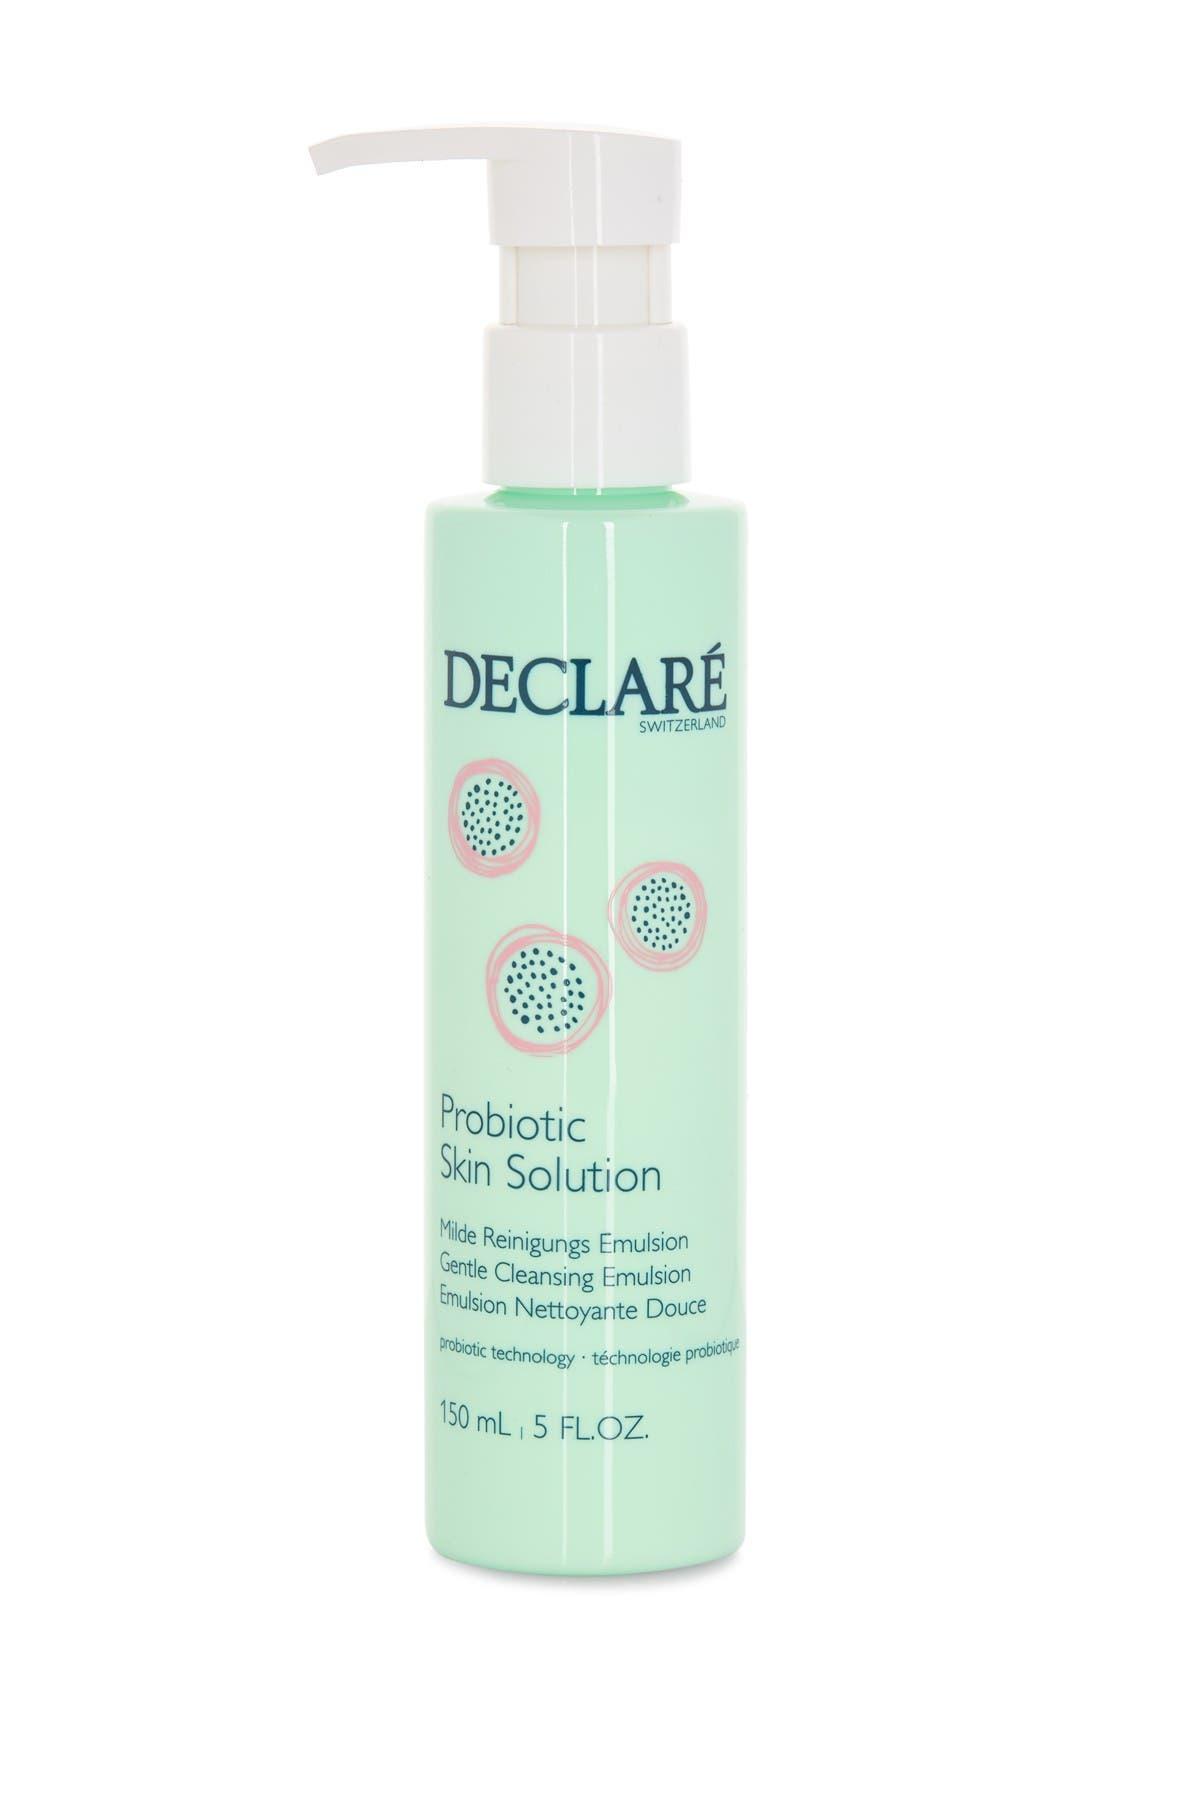 Image of DECLARE Probiotic Skin Solution Gentle Cleansing Emulsion